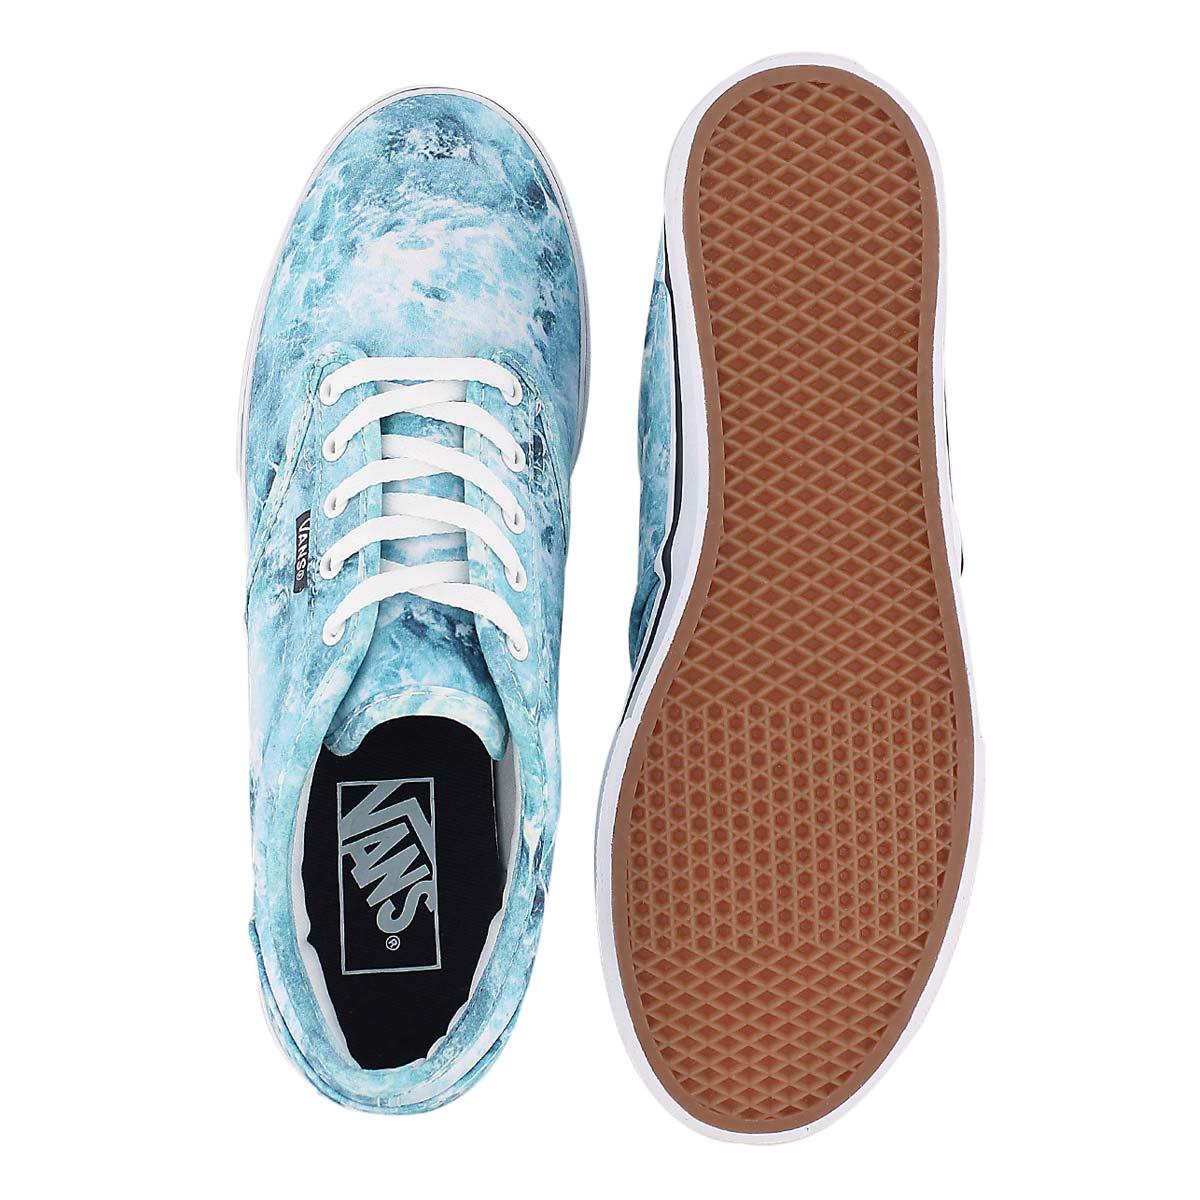 Lds Atwood Low ocean prnt laceup sneaker